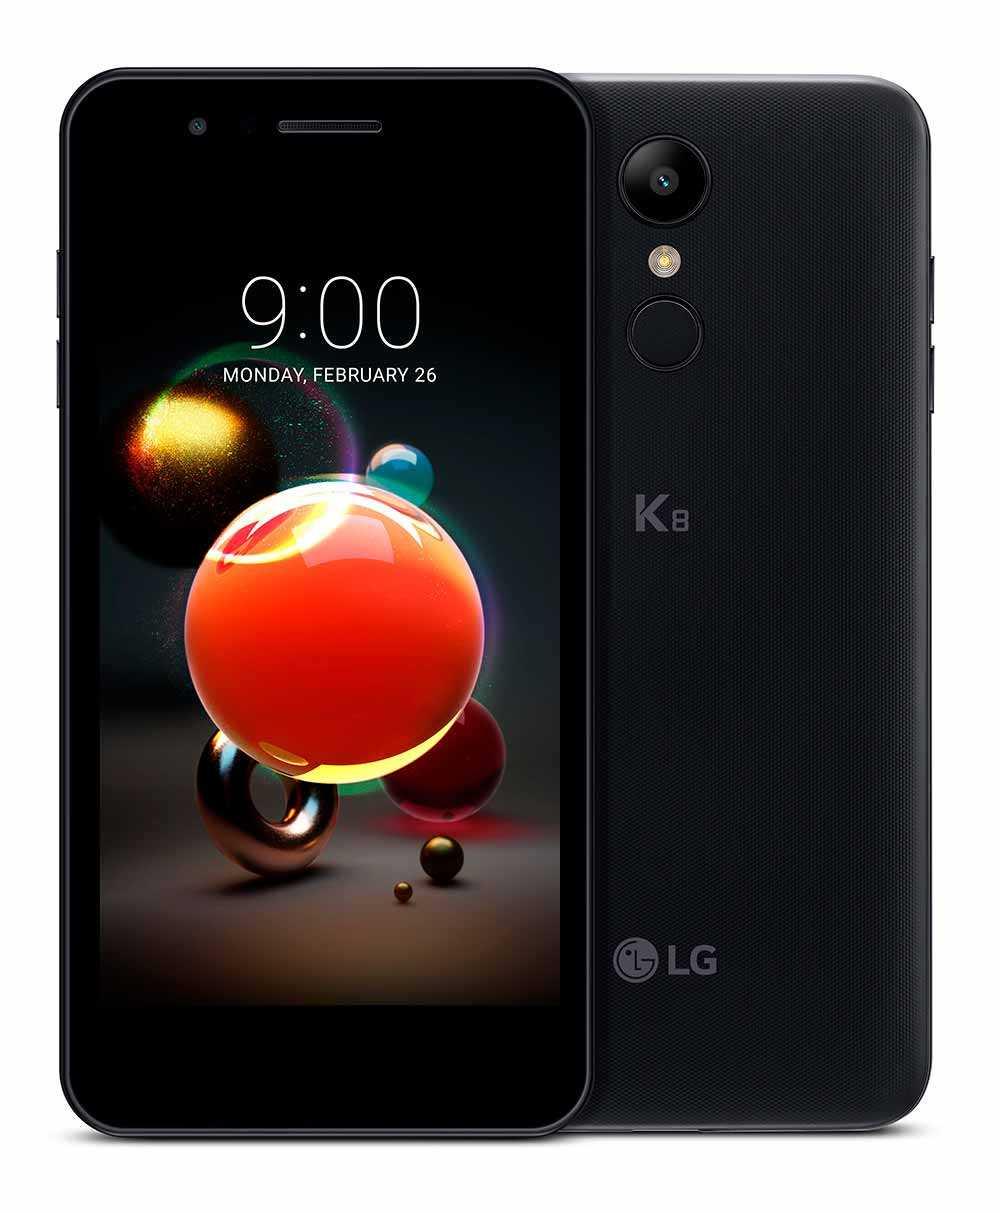 LG K8 Astro Black